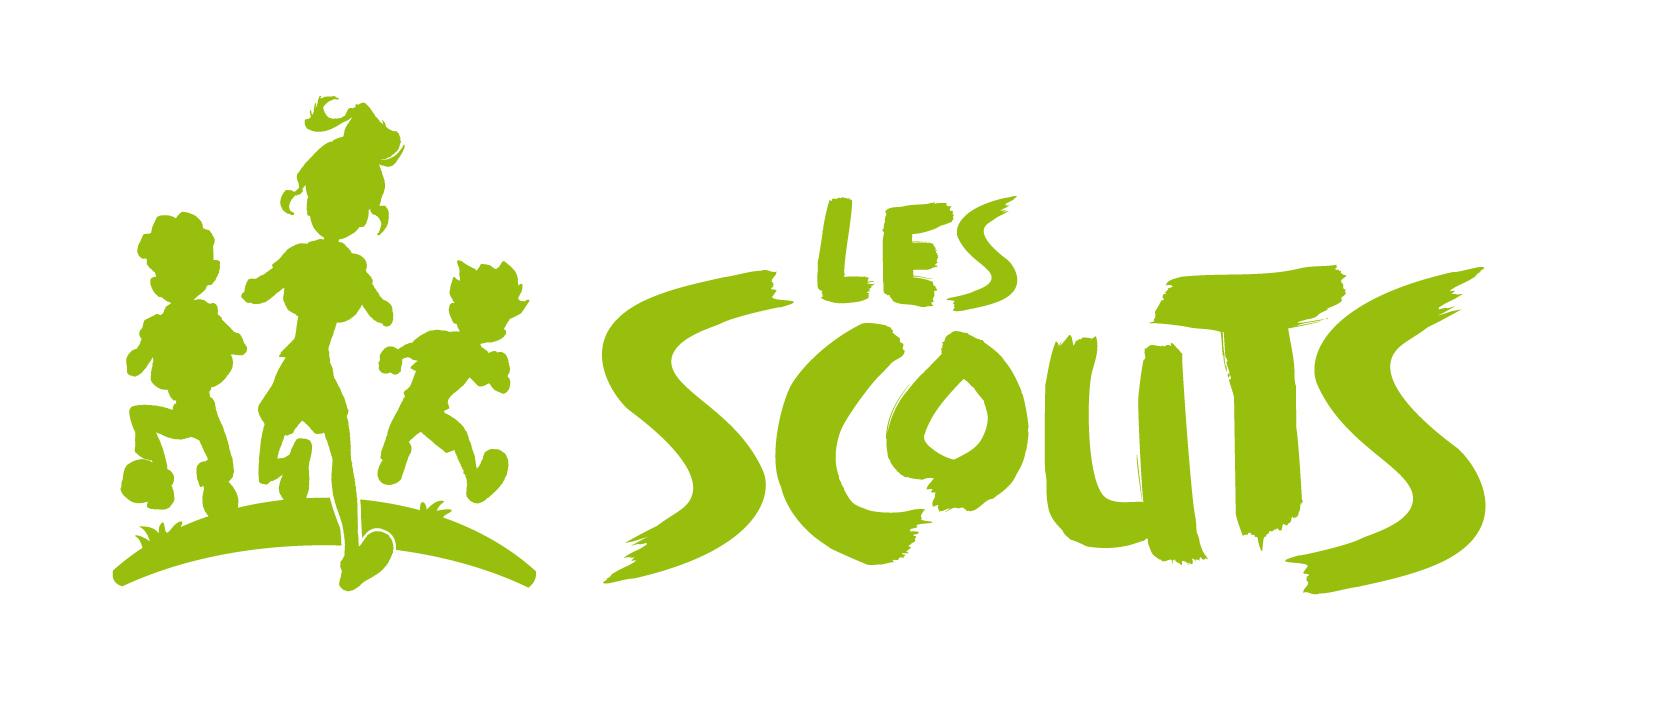 Les Scouts_horizontal_vert